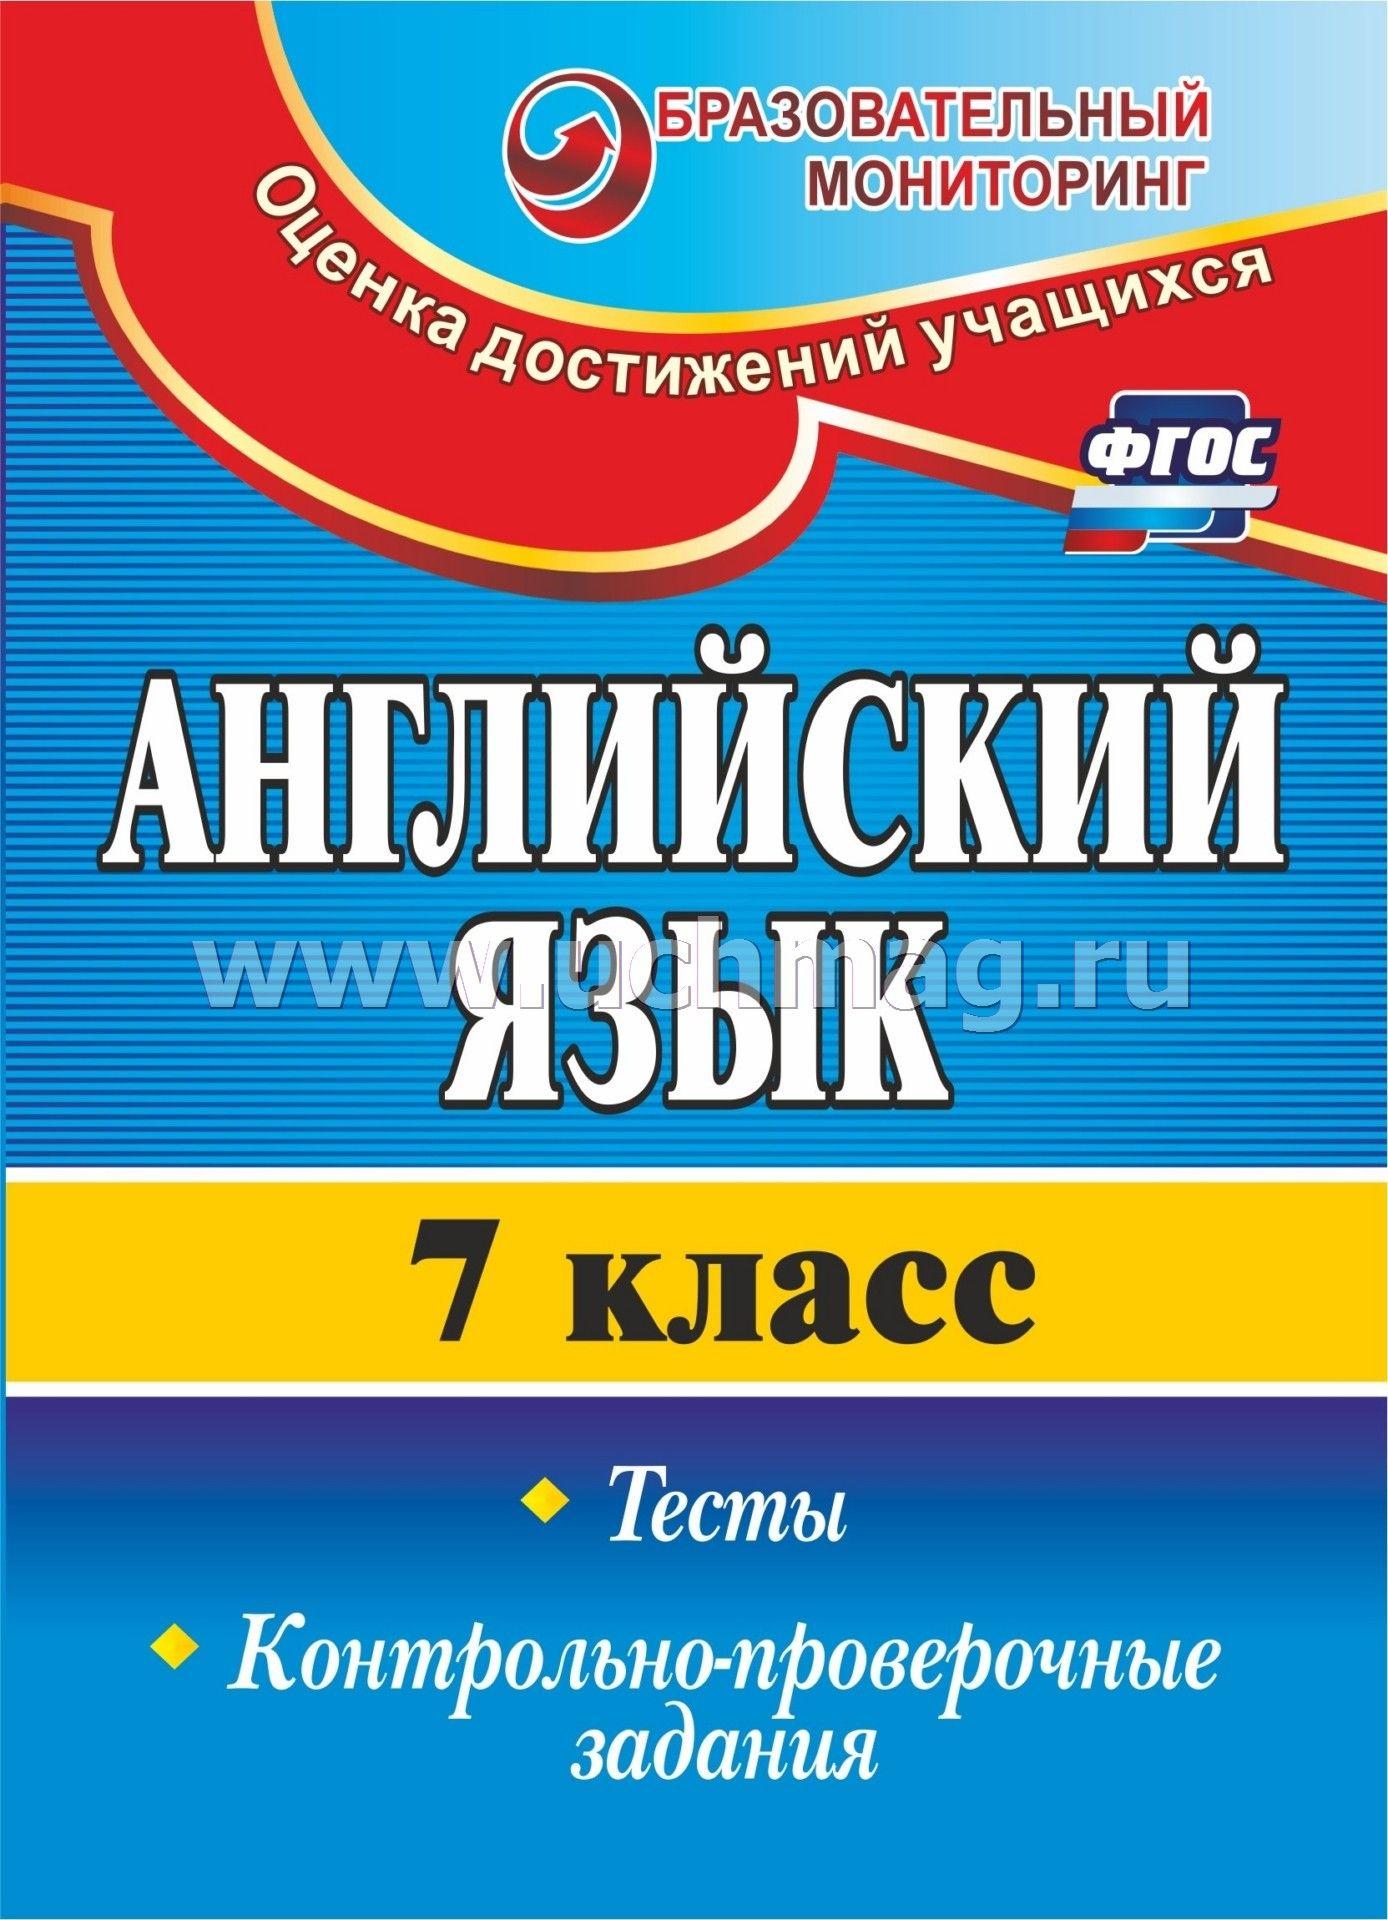 Онлайн мориторинг testreporter по русскому языку 7 класс